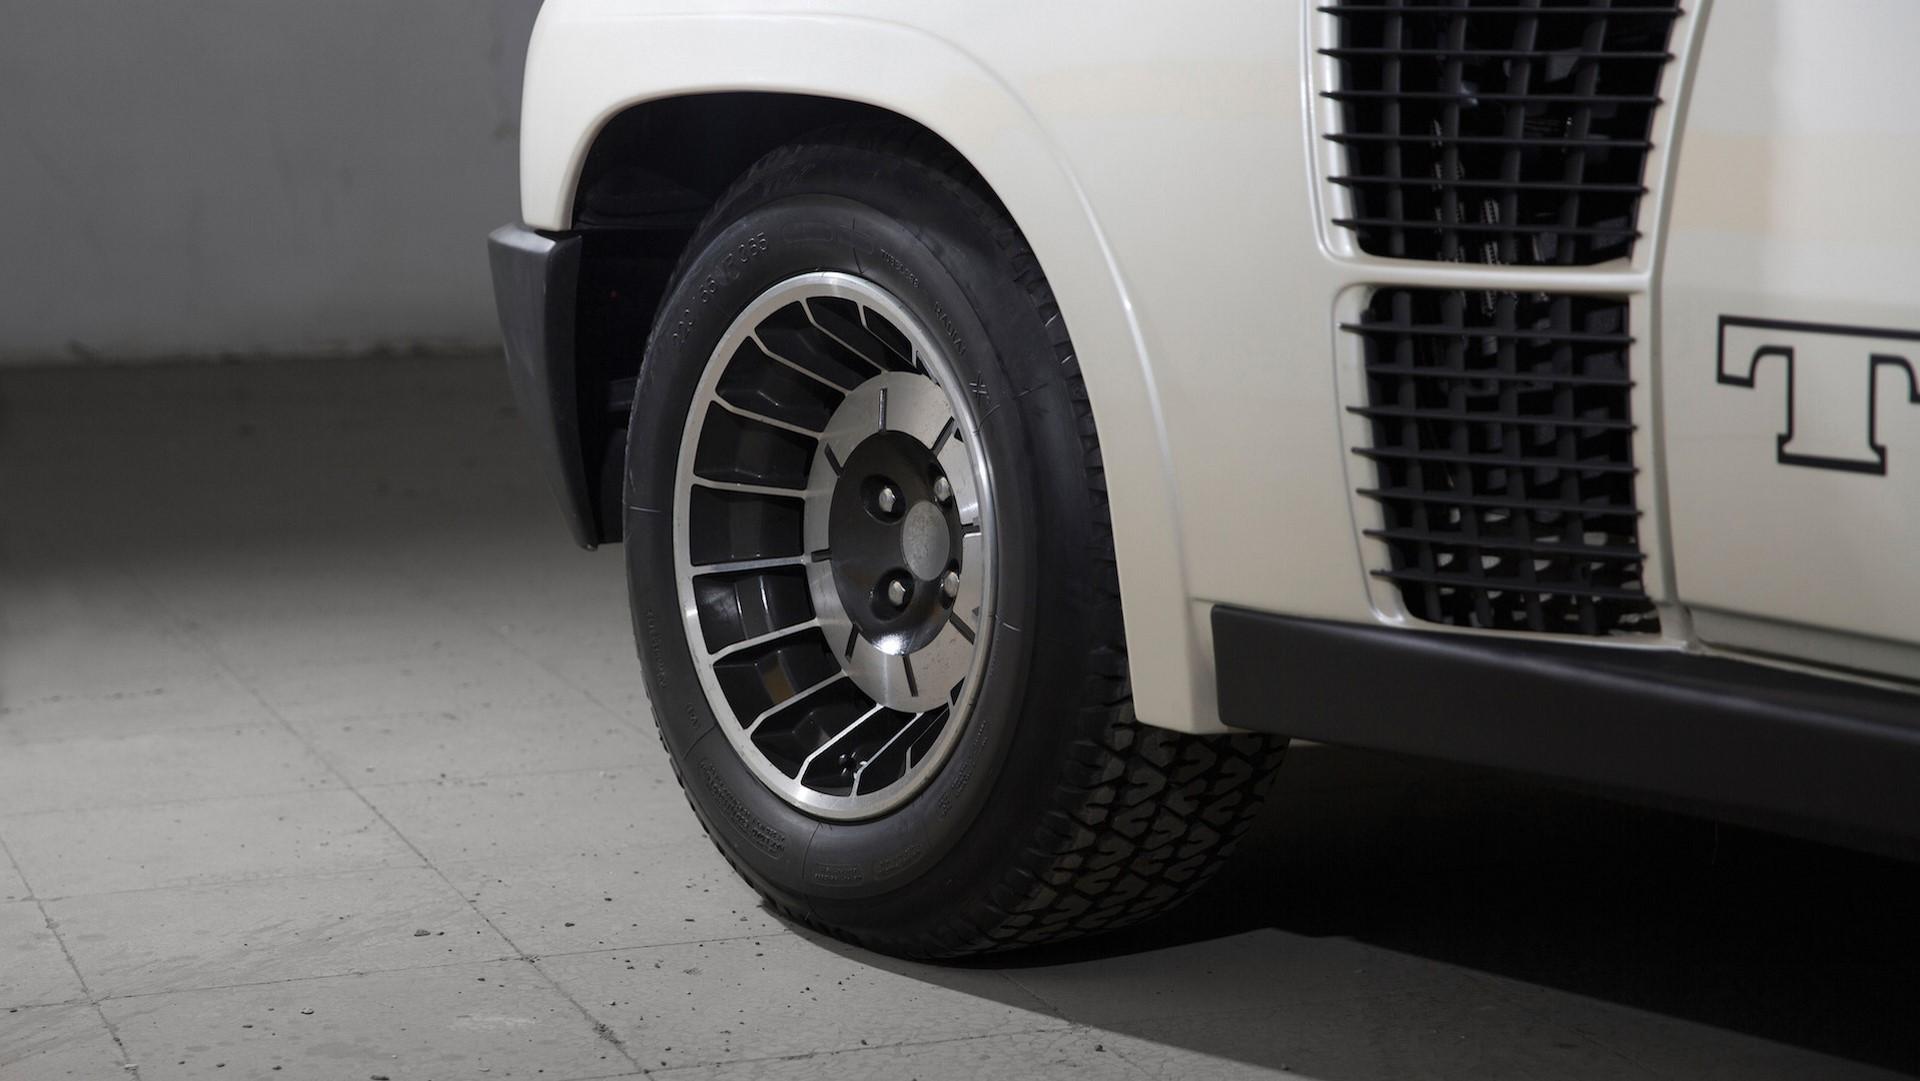 1983-renault-5-turbo-ii-auction (6)